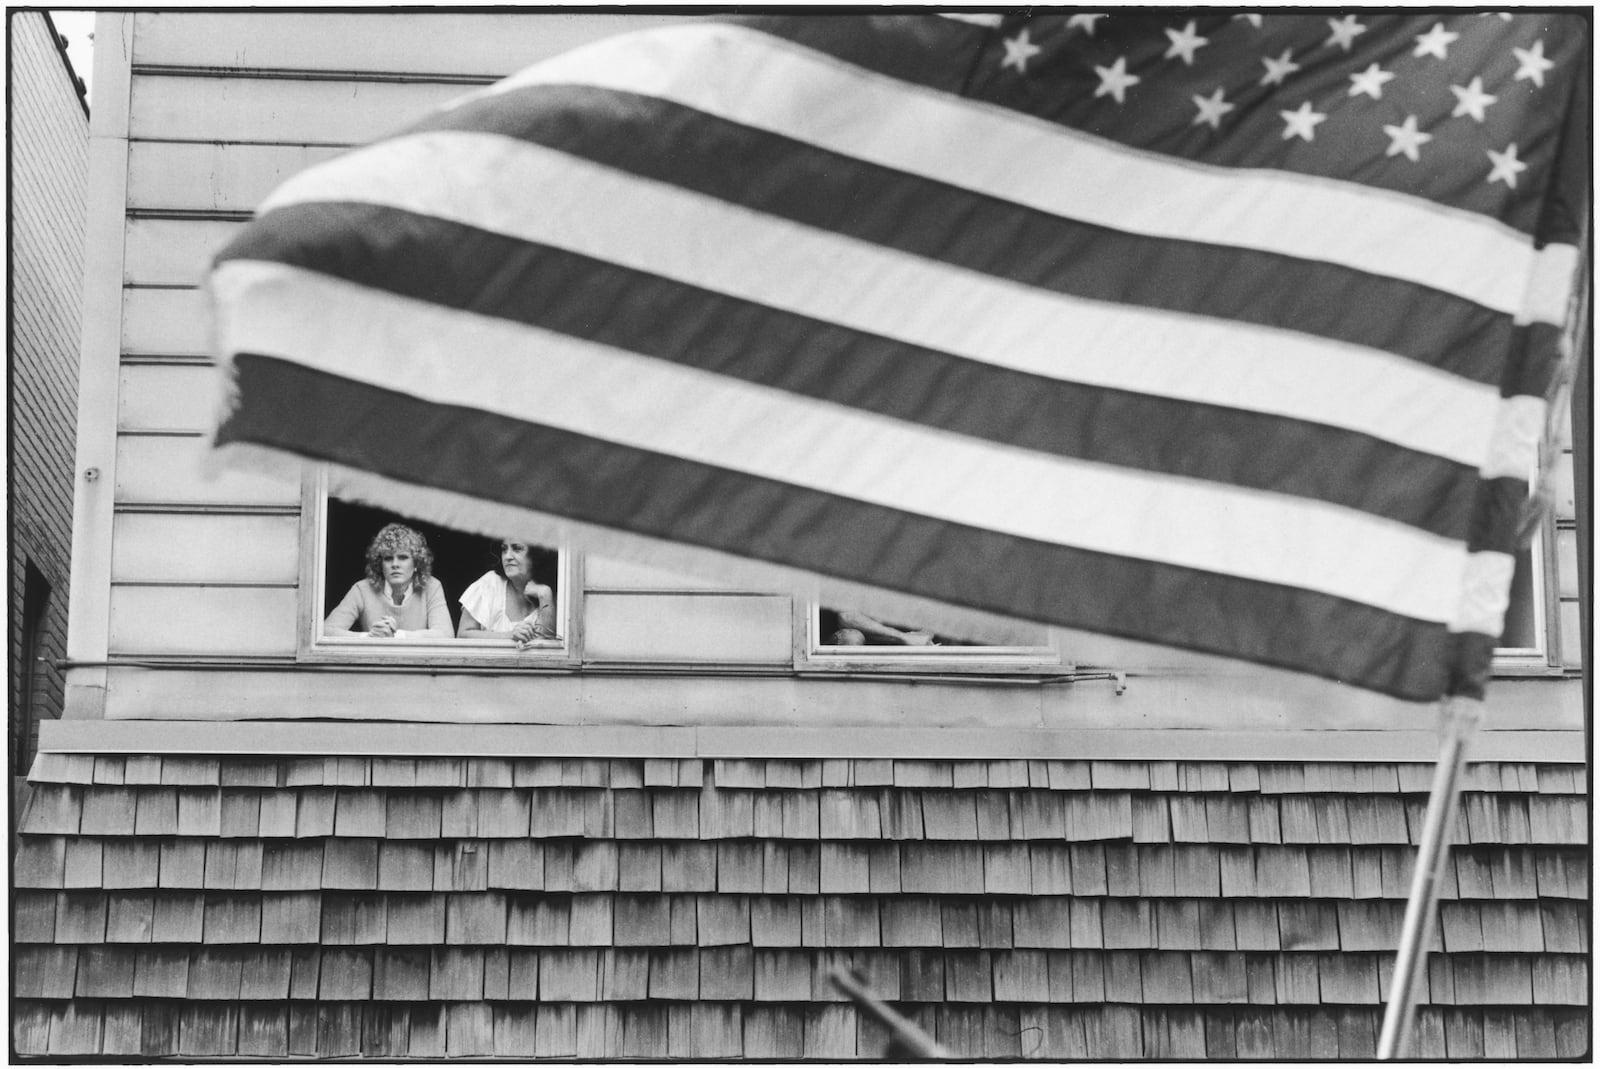 Tom Arndt, Two women & the flag, Payne Avenue, Saint Paul, Minnesota, 1982